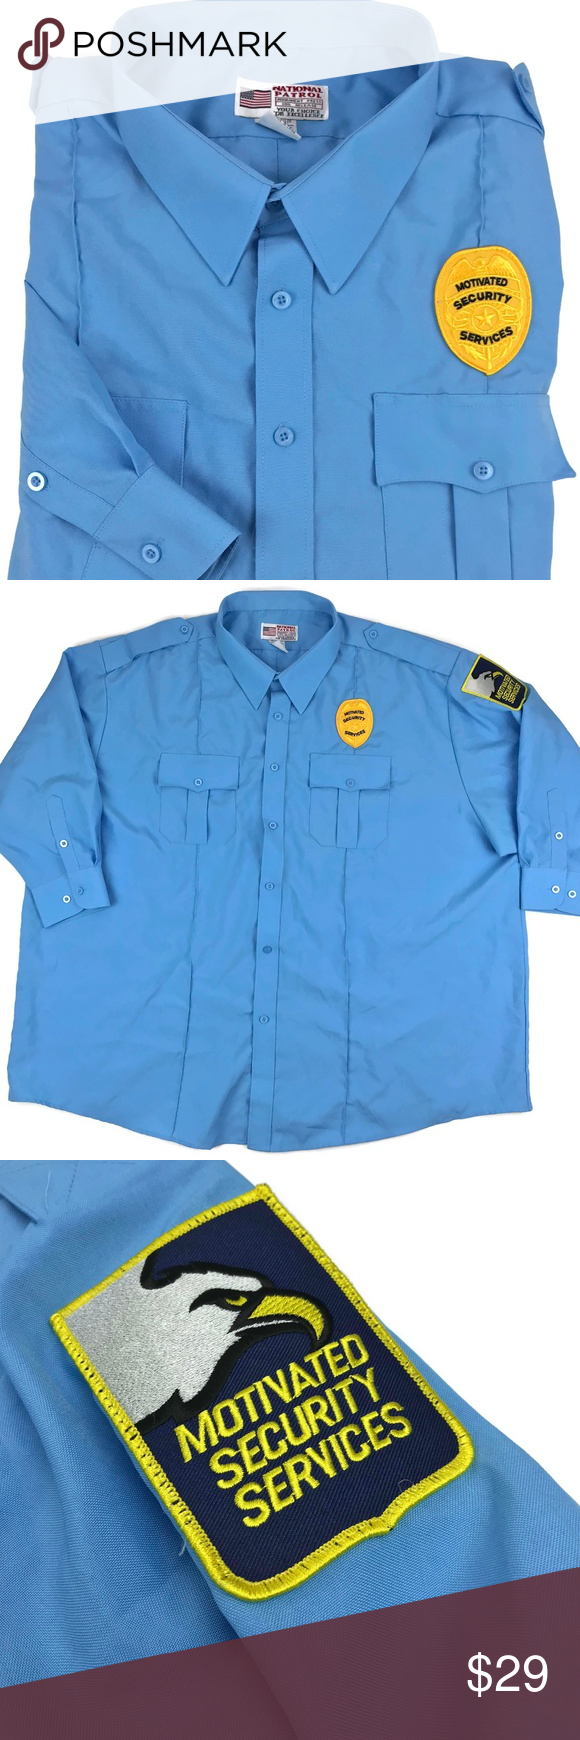 Security Guard Uniform Shirt Halloween Costume 4xl Uniform Shirts Shirts Colorful Shirts